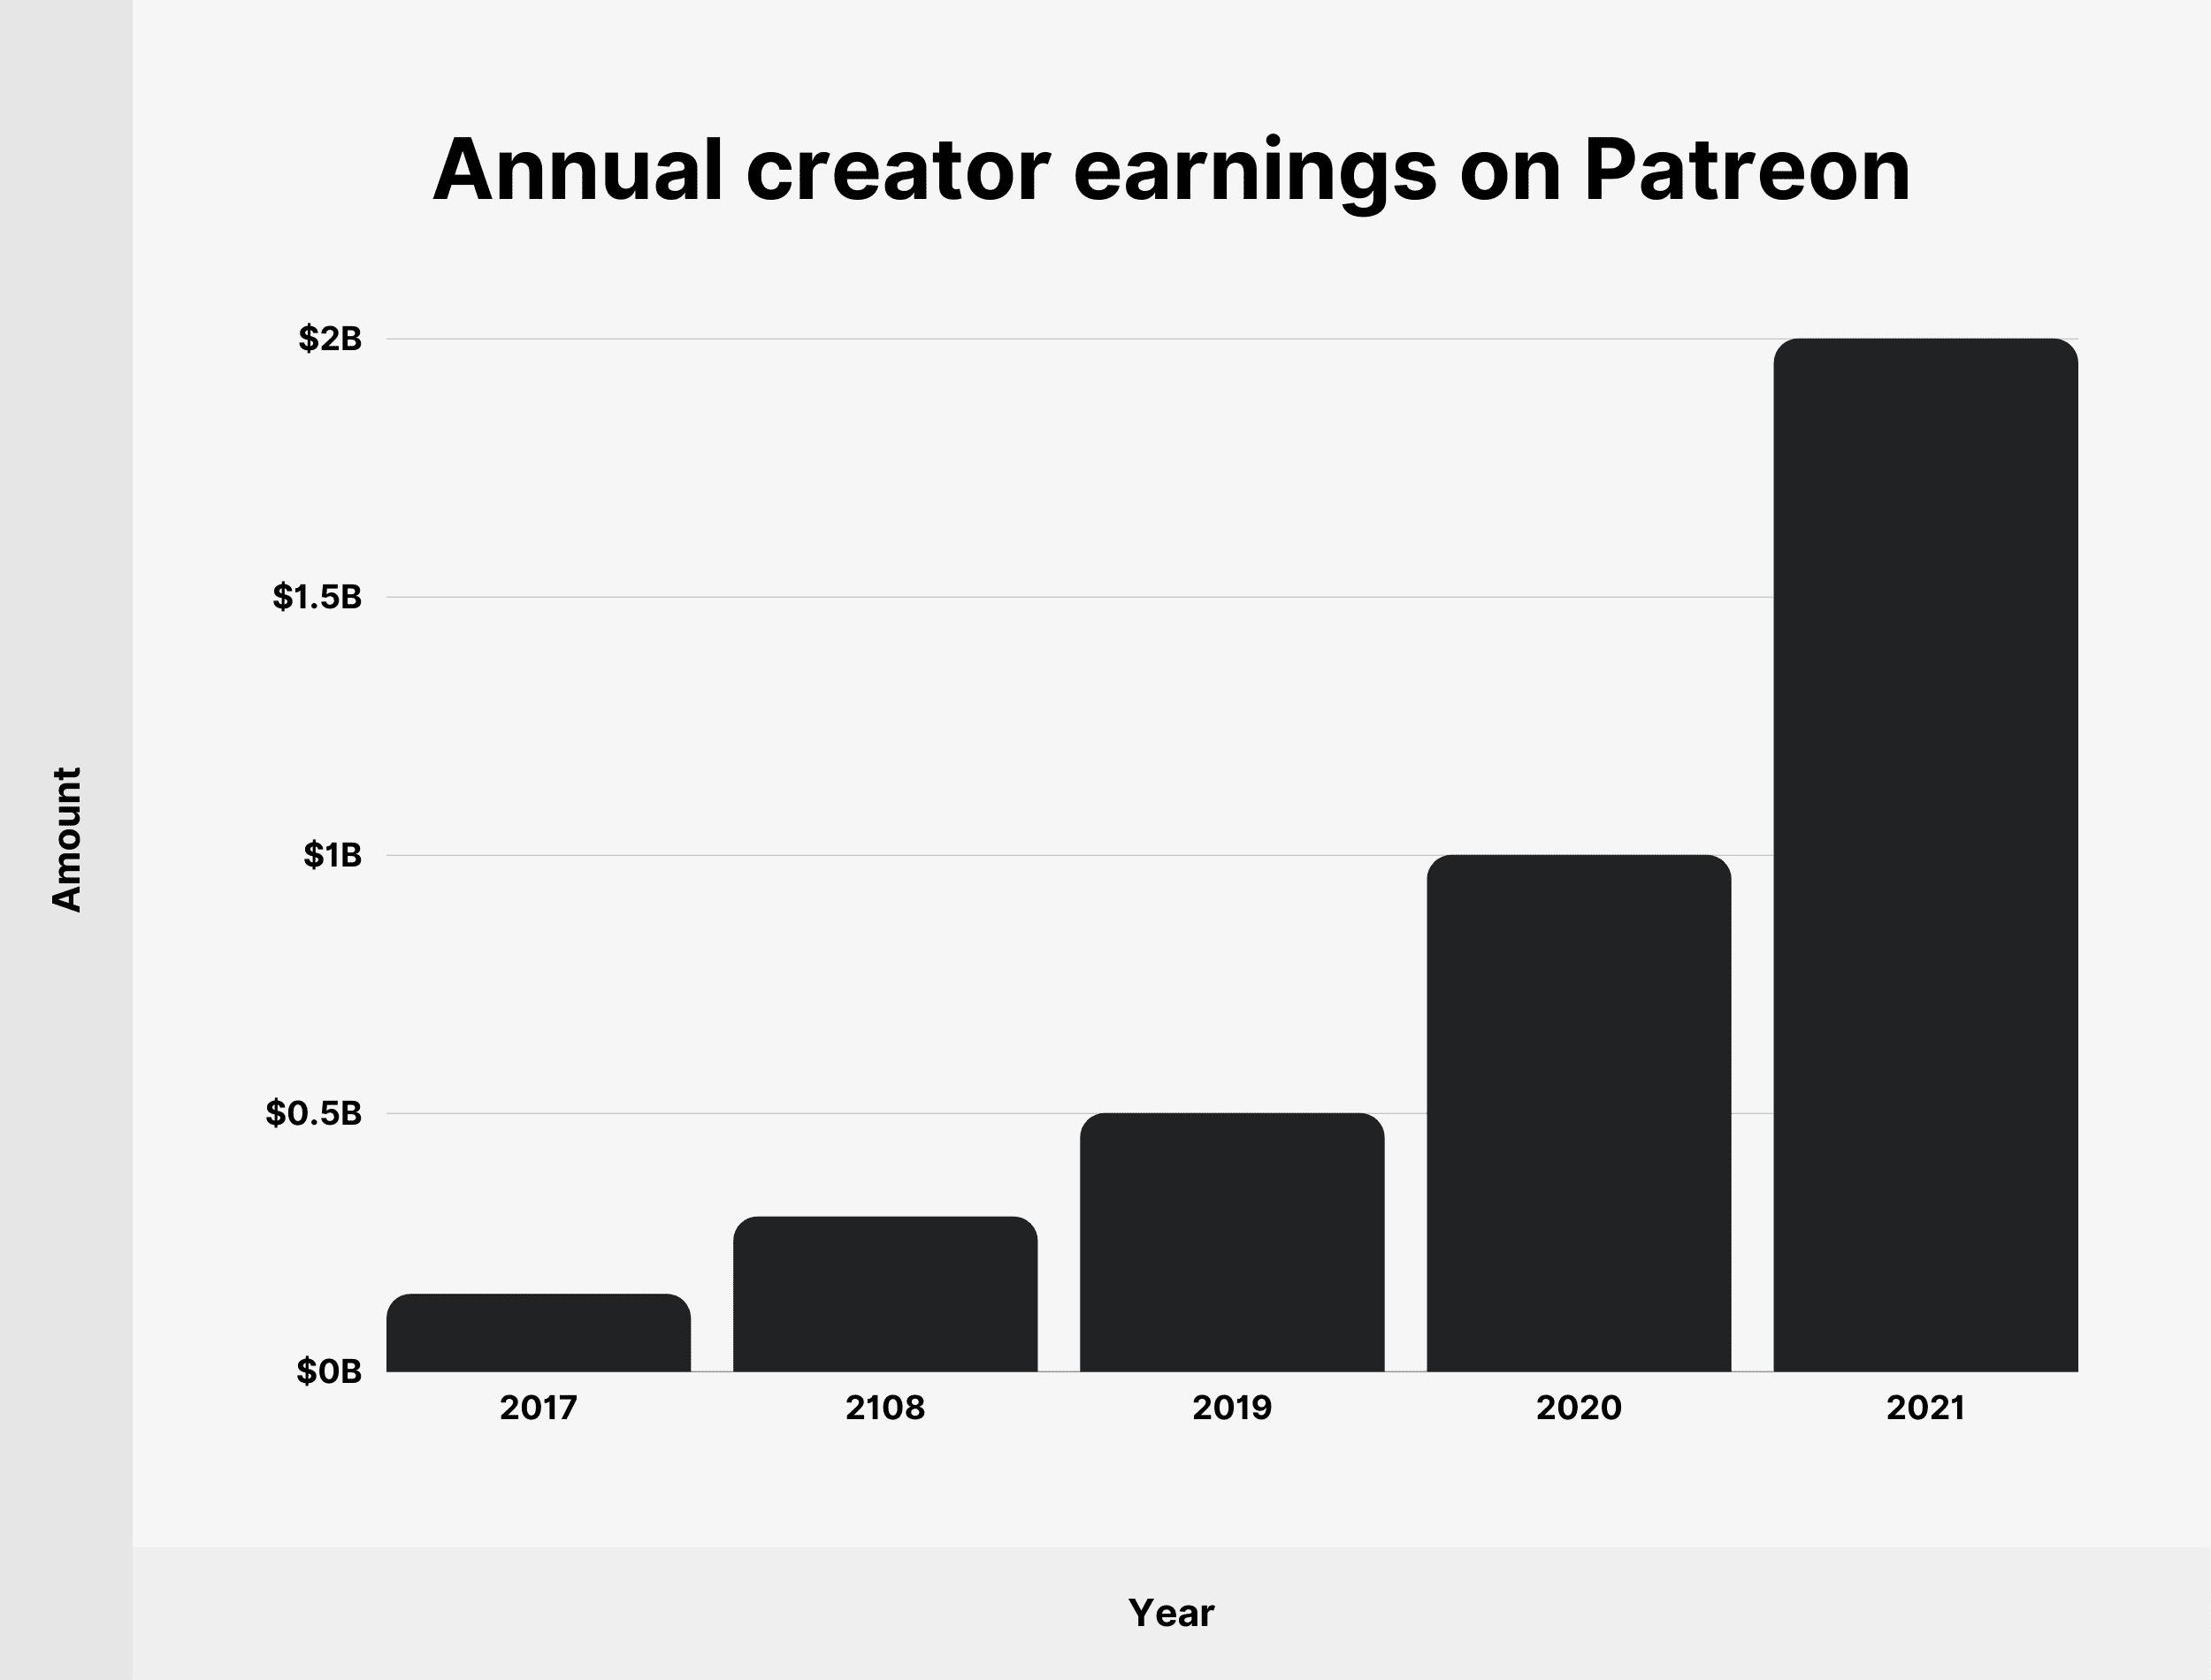 Annual creator earnings on Patreon